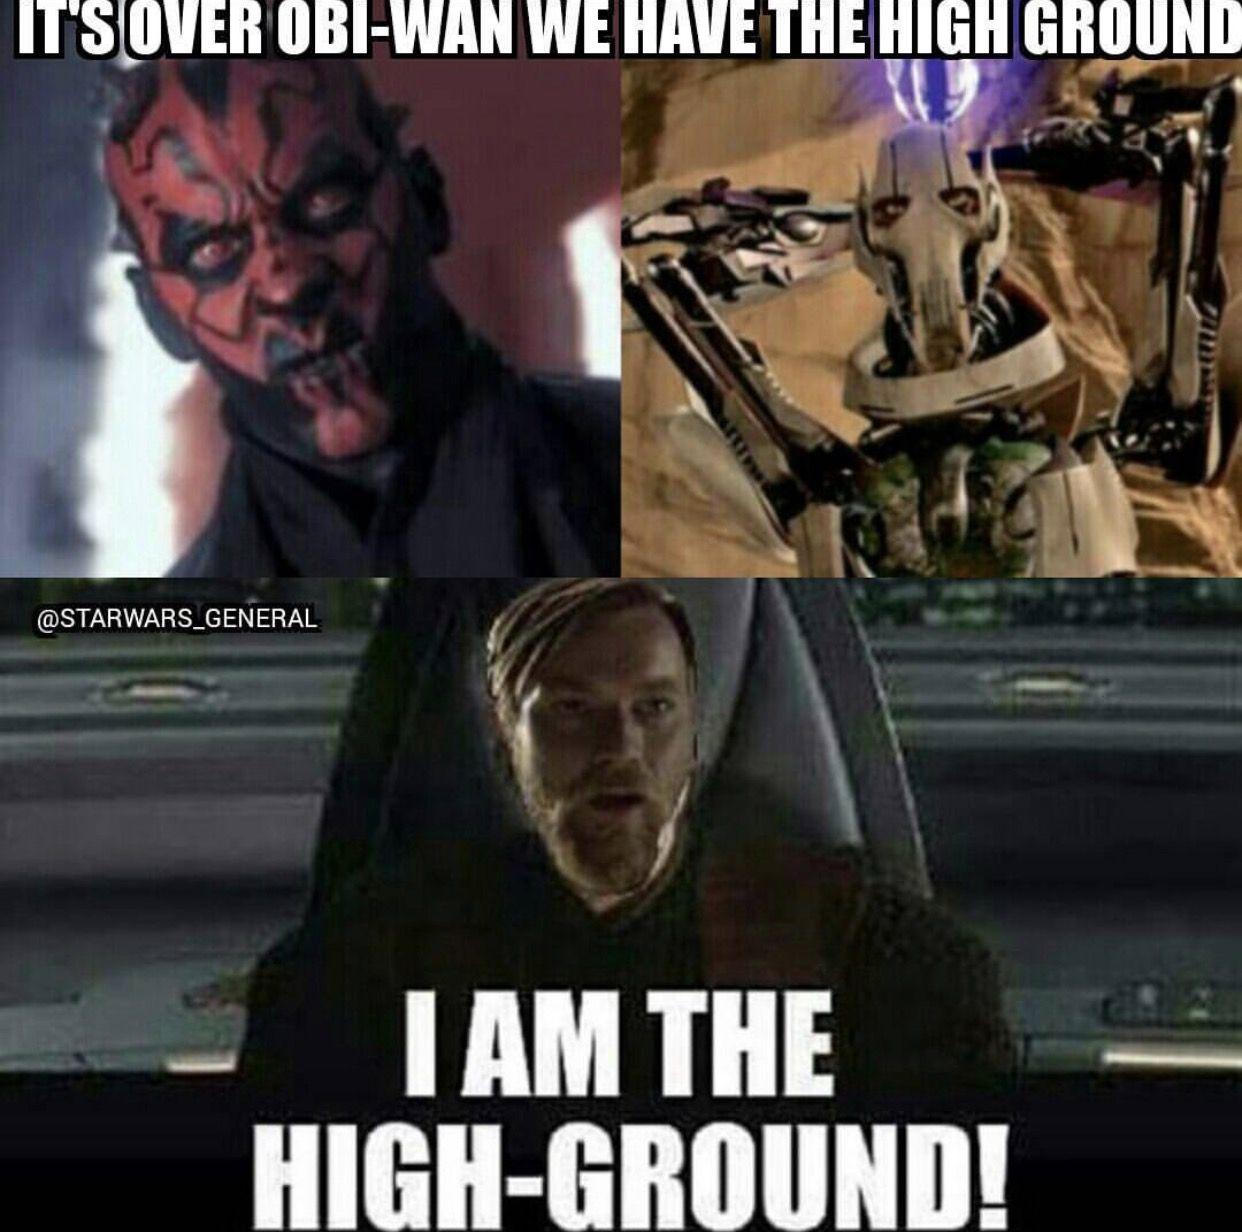 5ed822f6215d32636afabf7bfaa7100f i am the high ground! star wars pinterest higher ground, star